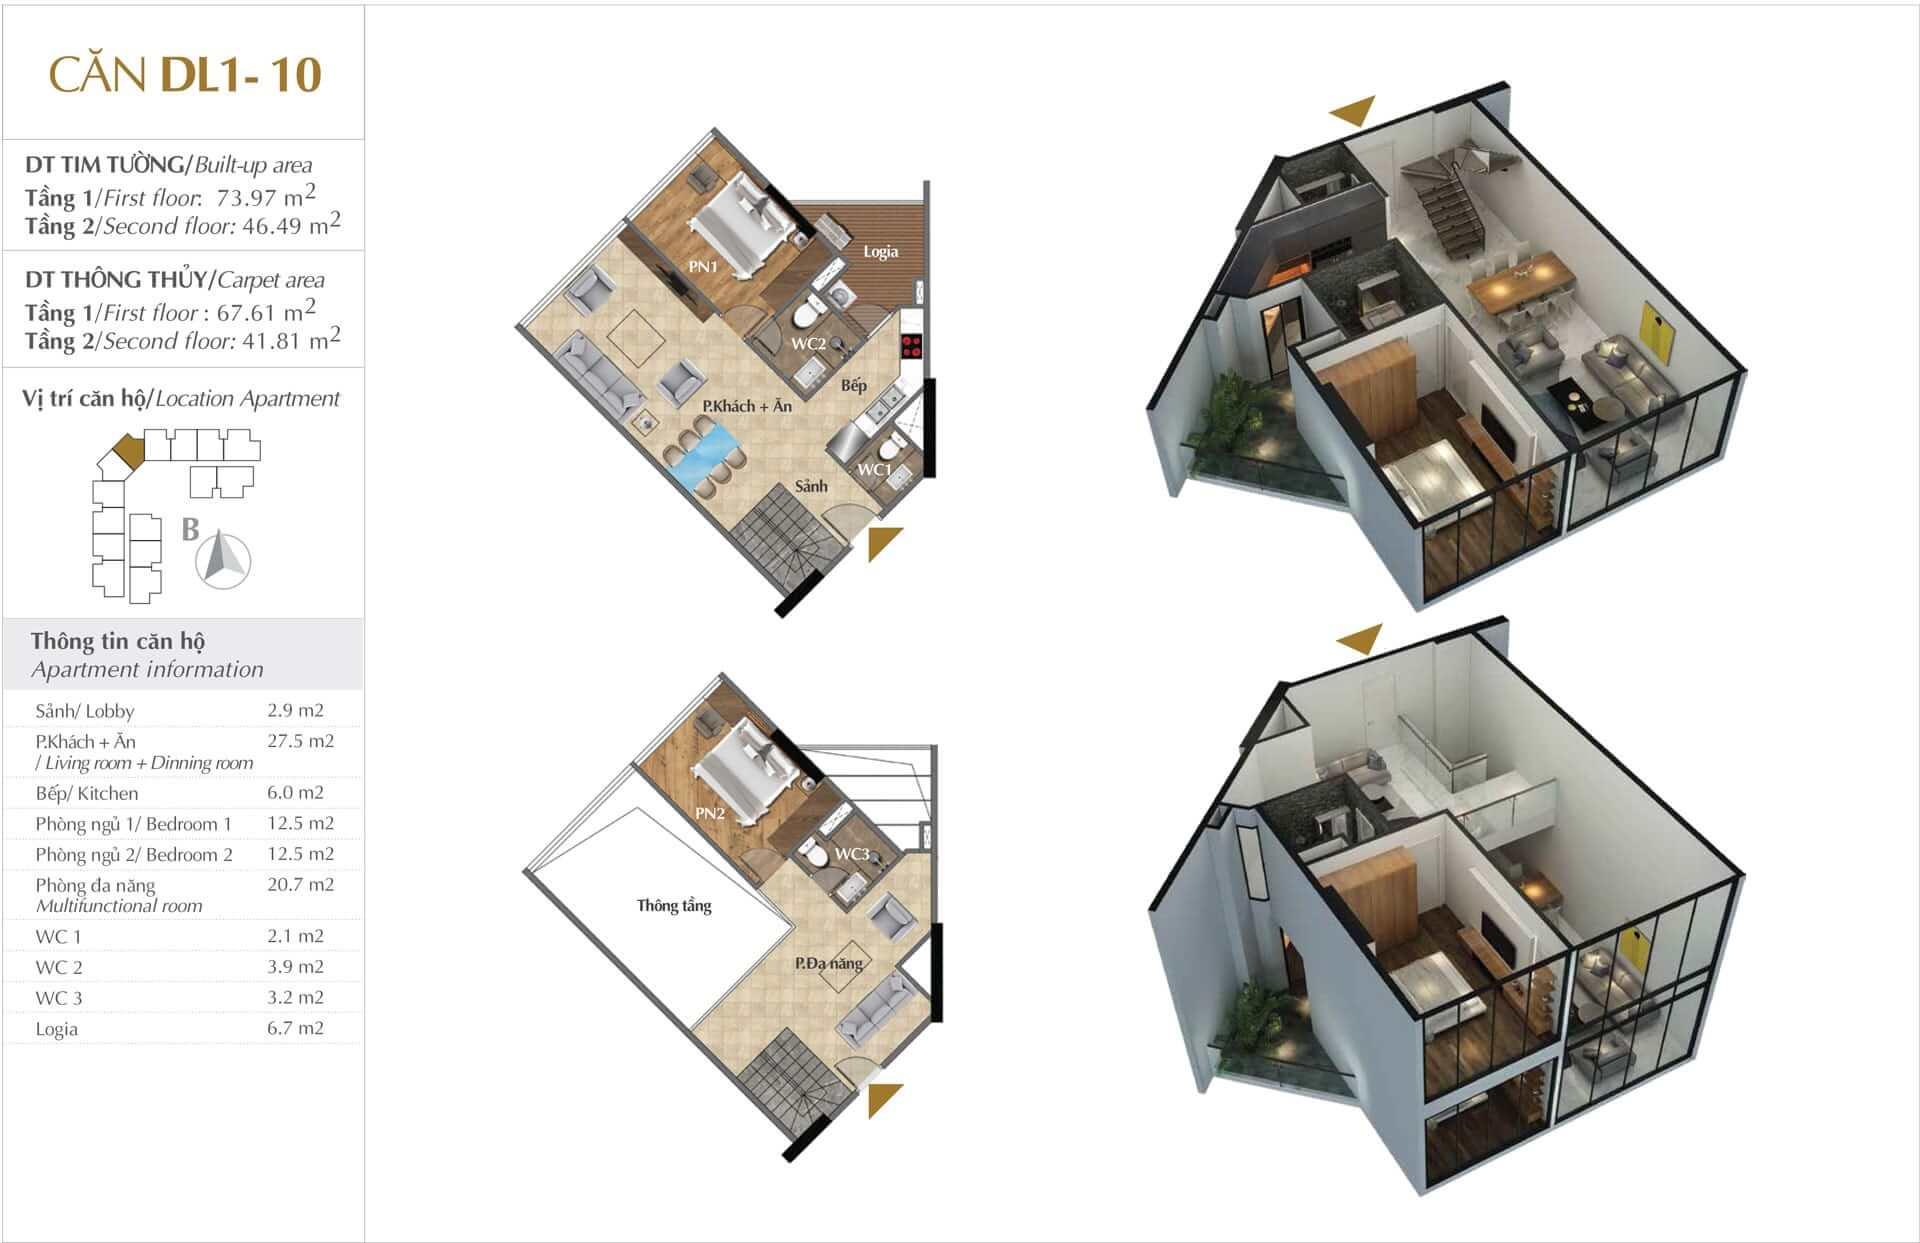 Thiết kế căn DL1 - 10